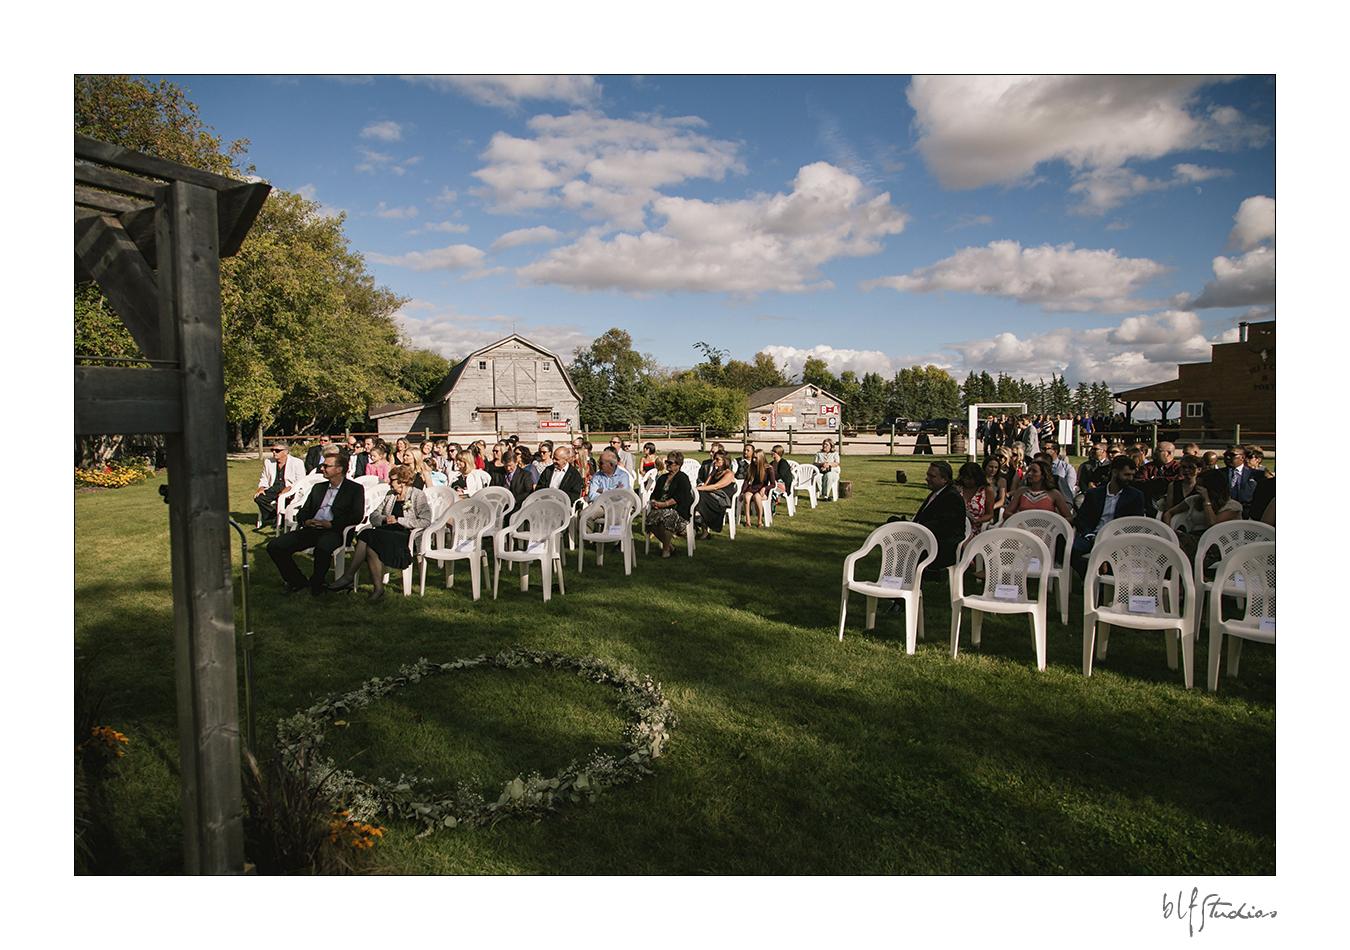 024-winnipeg-hitchnpost-wedding-marla-alana.jpg